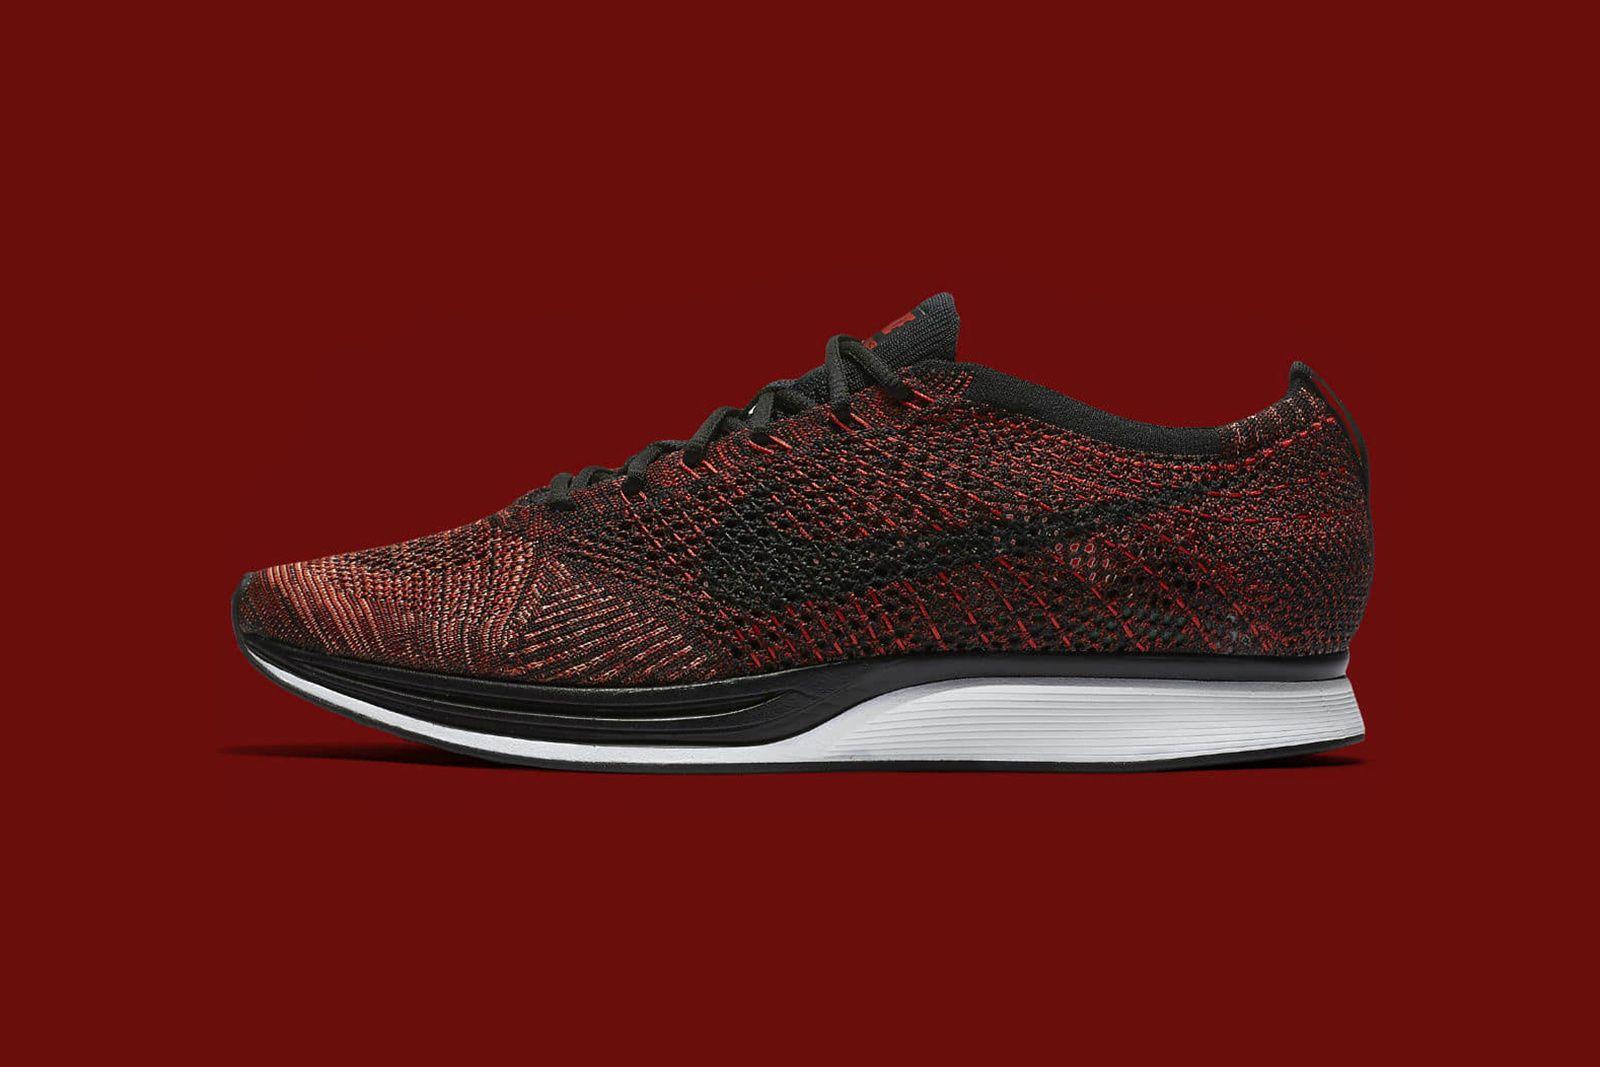 new product 6a56d b9009 Nike Flyknit Racer University Red Black Bright Mango